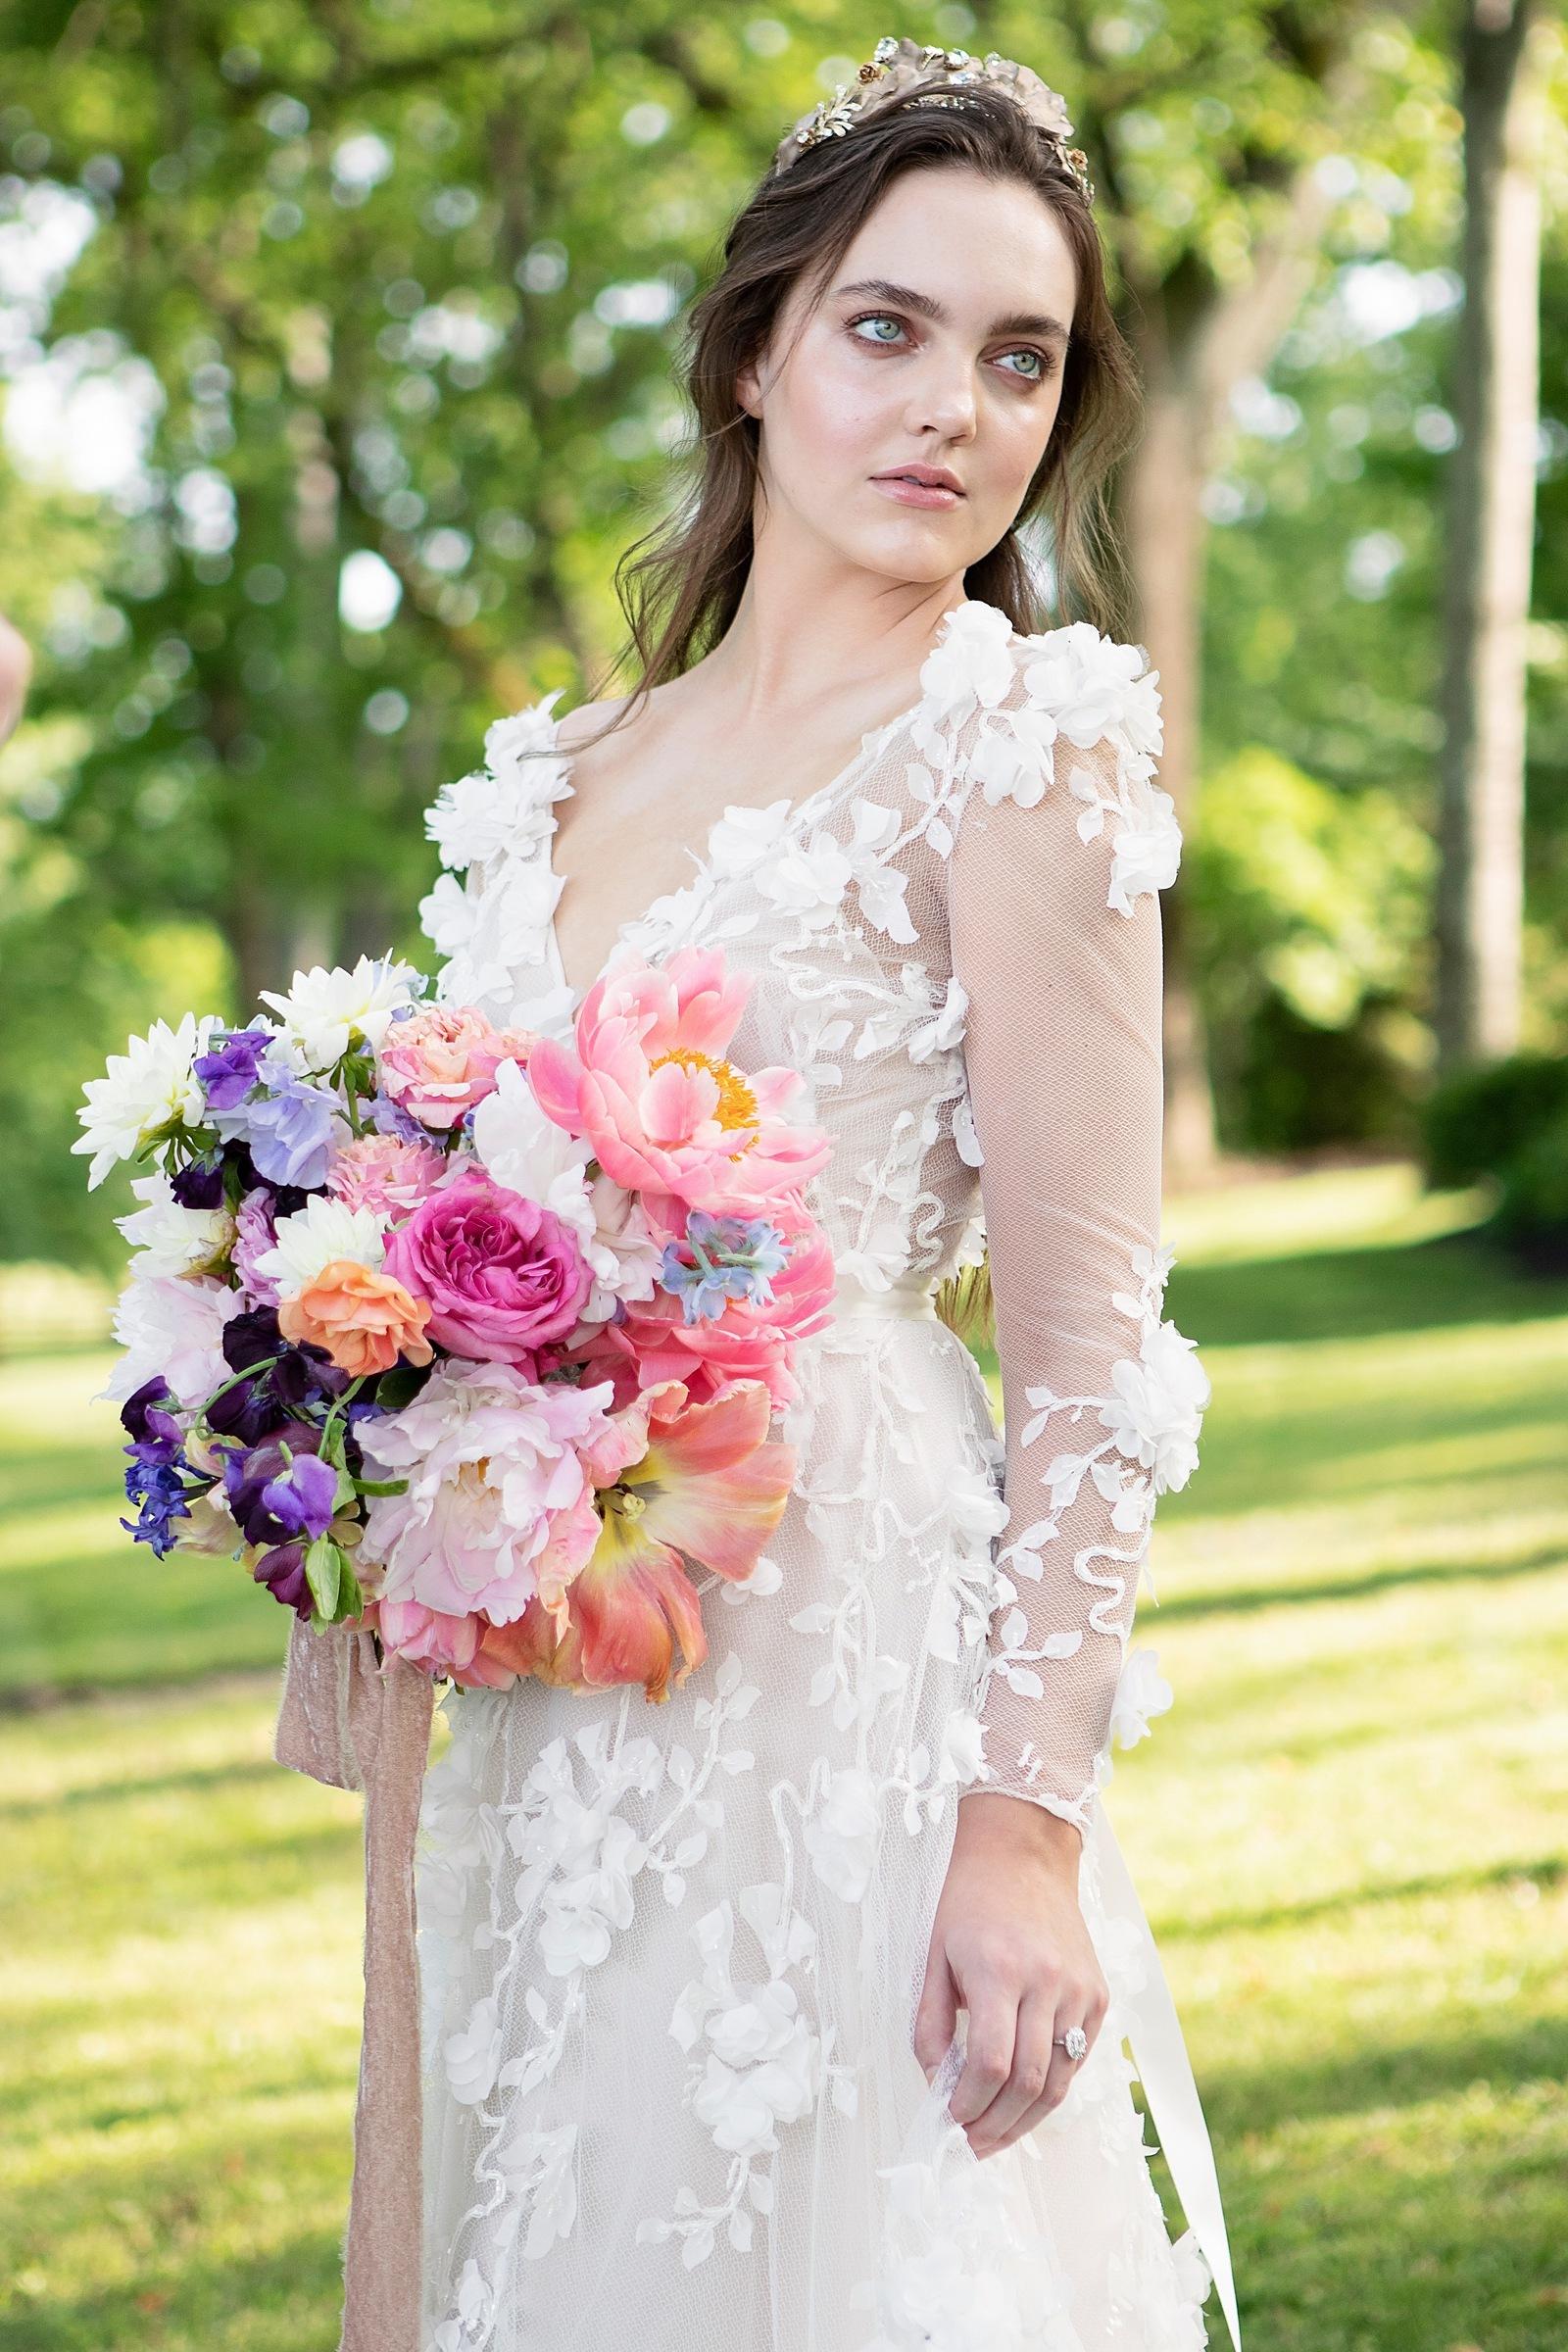 Watercolor wedding bouquet